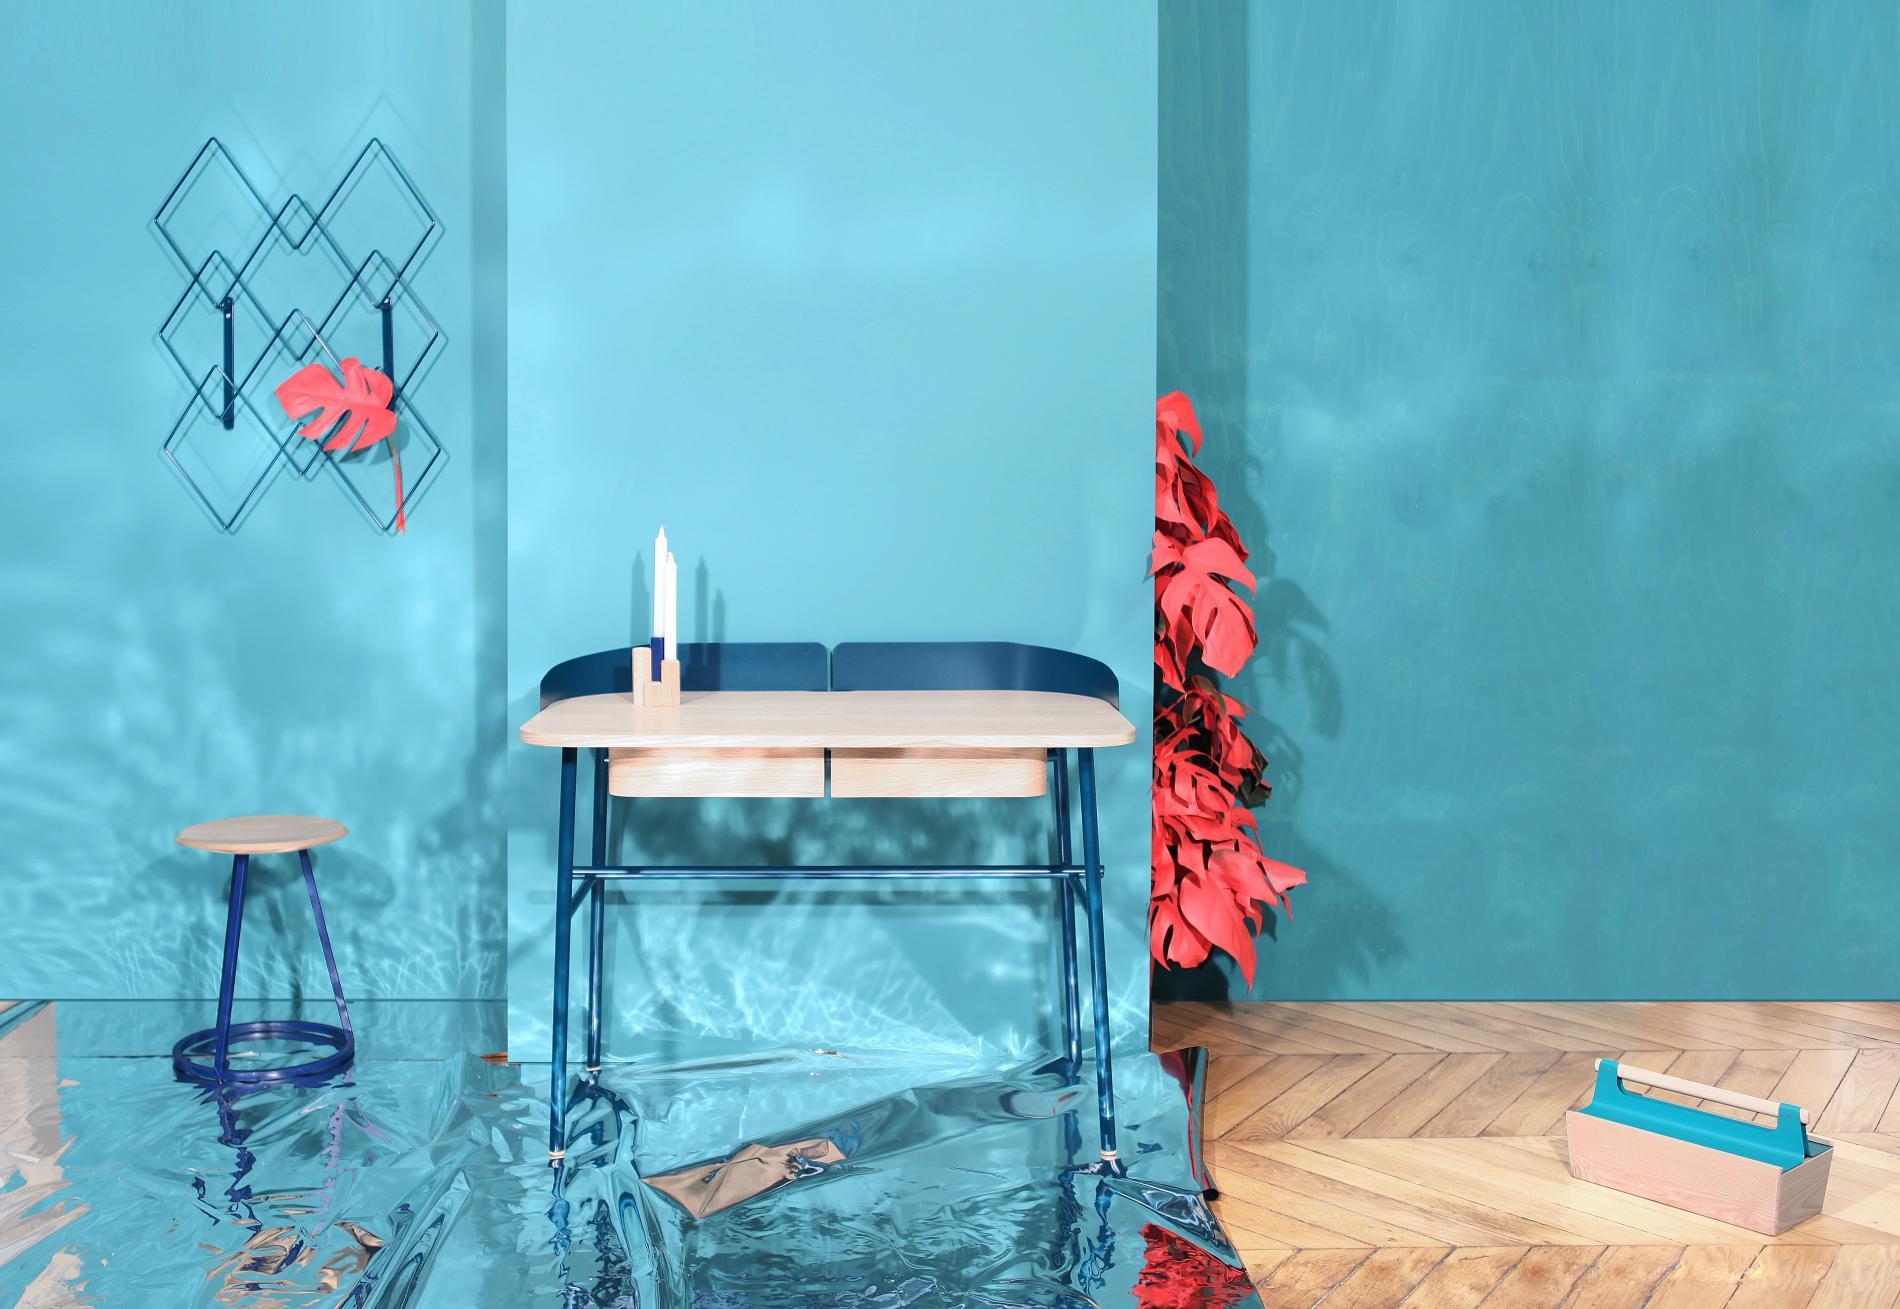 paris design week 2016 la capitale soigne son apparence madame figaro. Black Bedroom Furniture Sets. Home Design Ideas